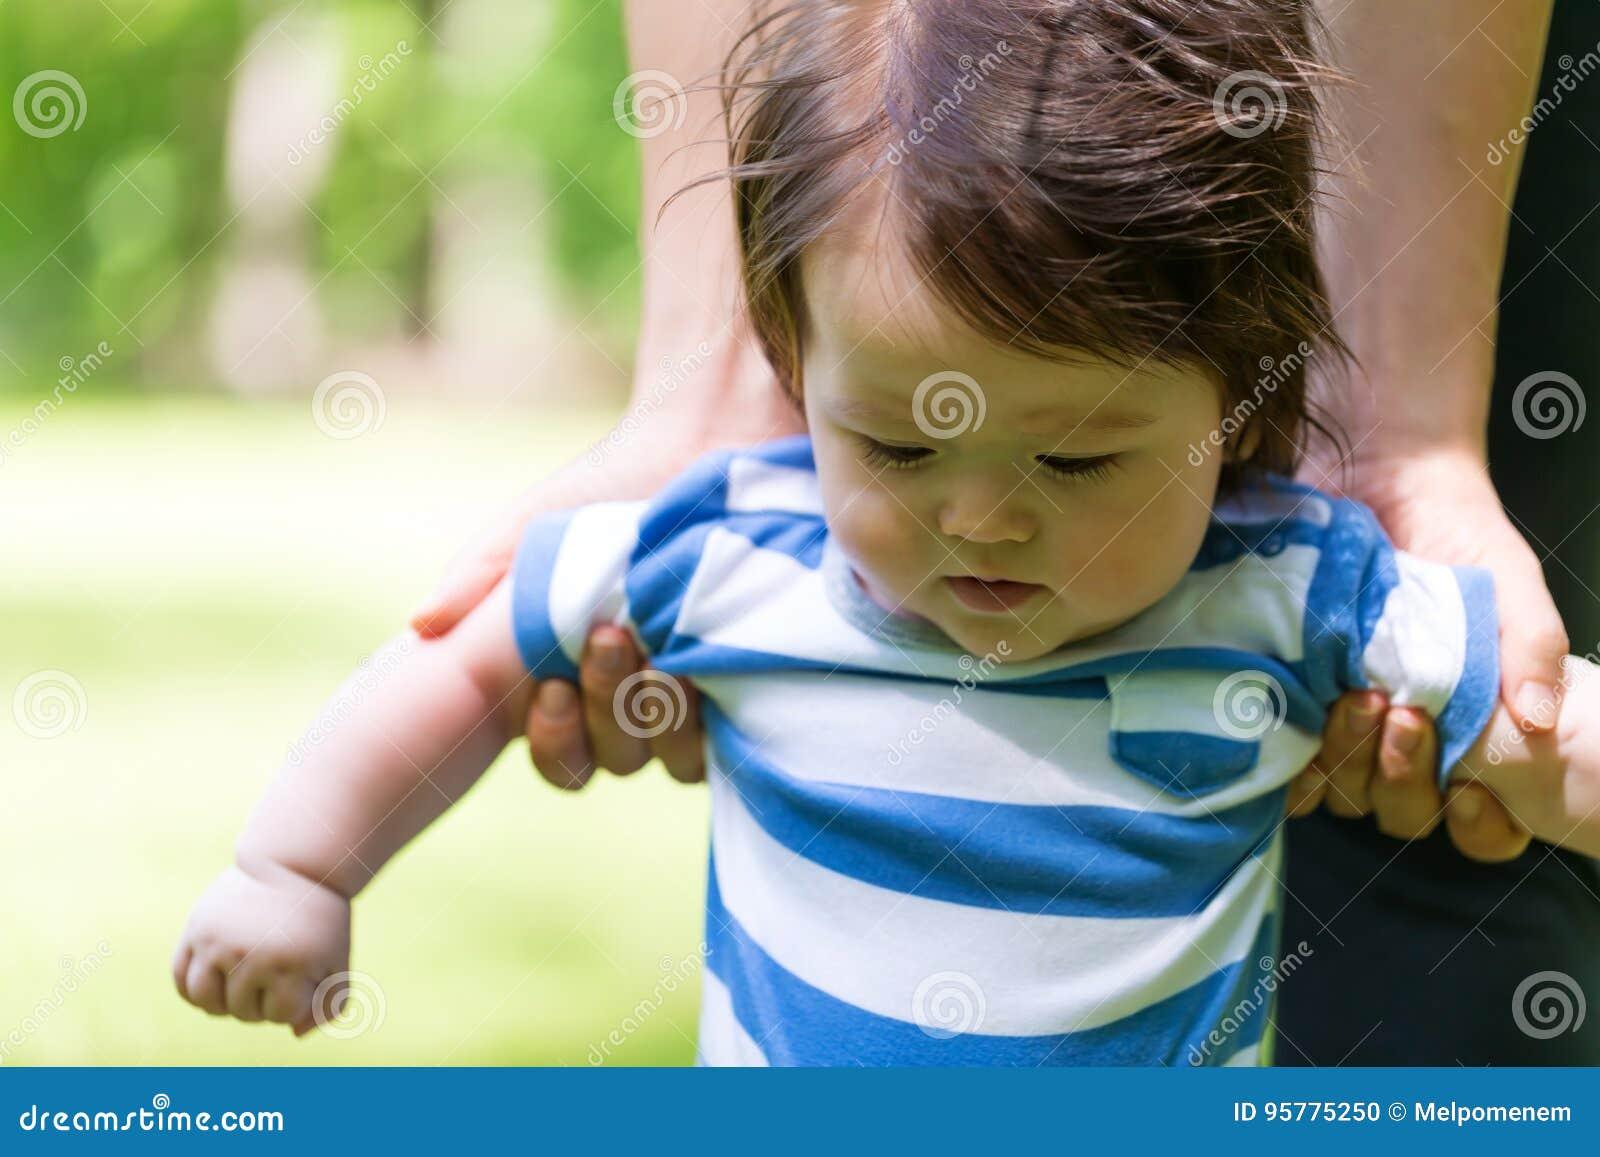 how to help baby walk